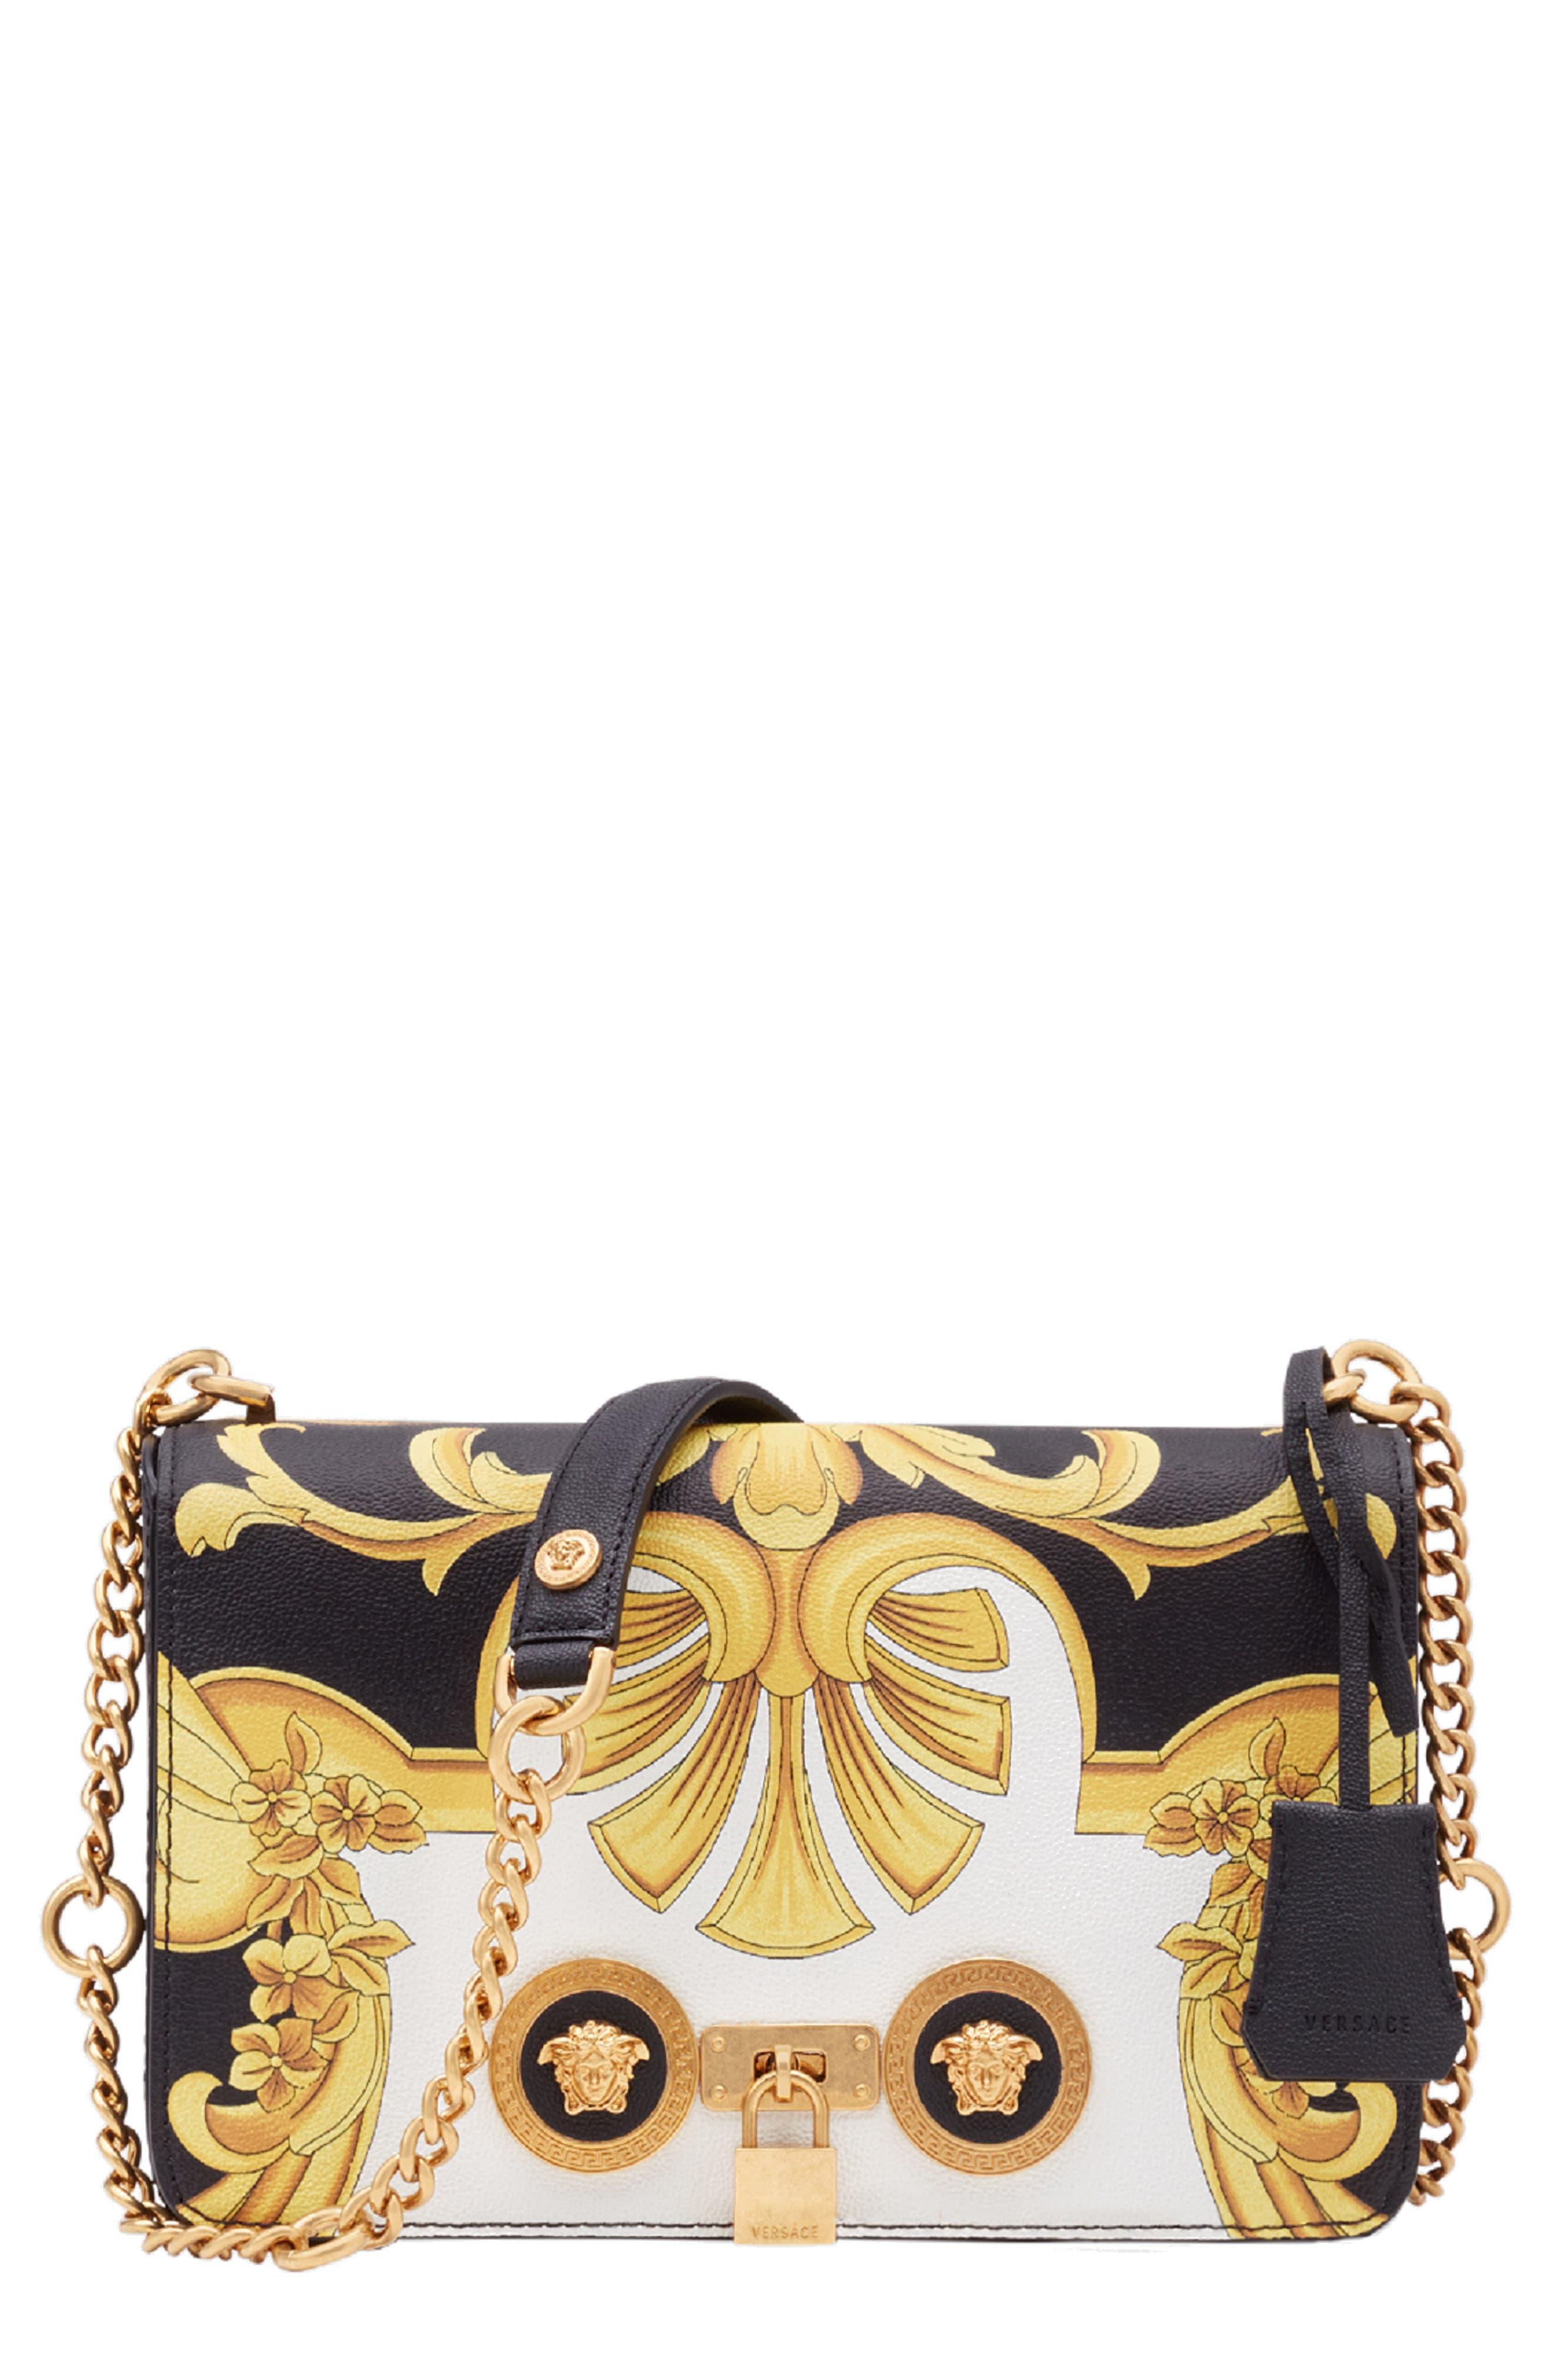 Bags Versace for Women  e6e8fcba879a8